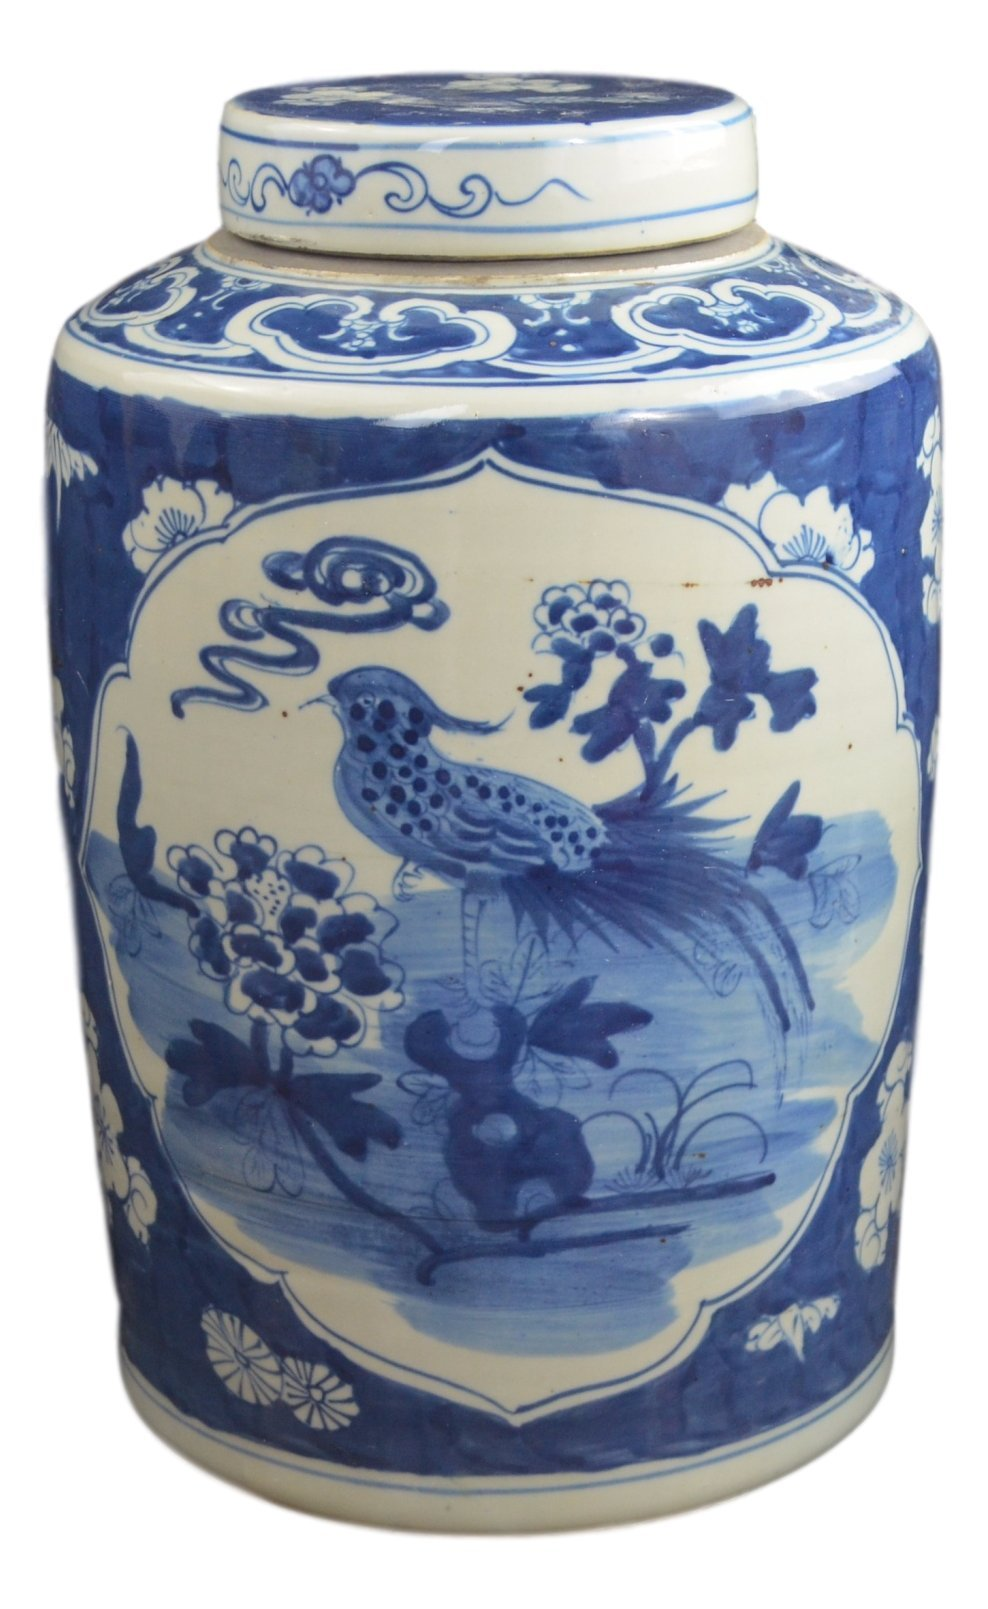 15'' Antique Finish Blue and White Porcelain Bird and Flowers Ceramic Covered Jar Vase, China Ming Style, Jingdezhen (L10)